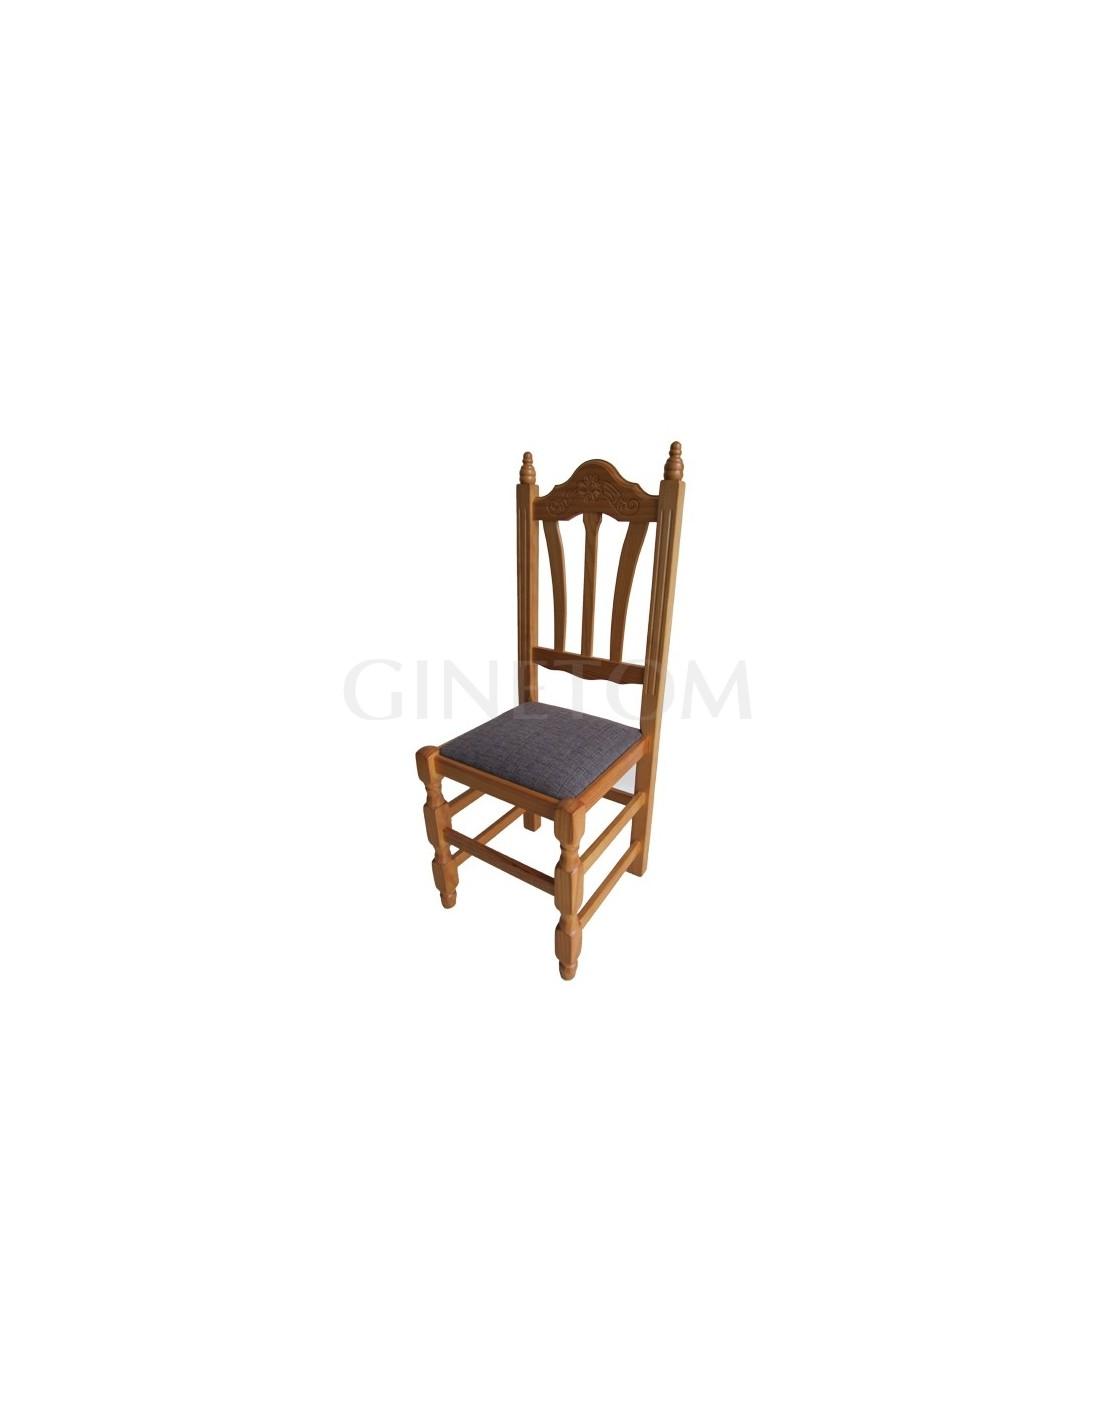 Sillas de madera ref 170 sillas hosteler a de ginetom for Sillas hosteleria